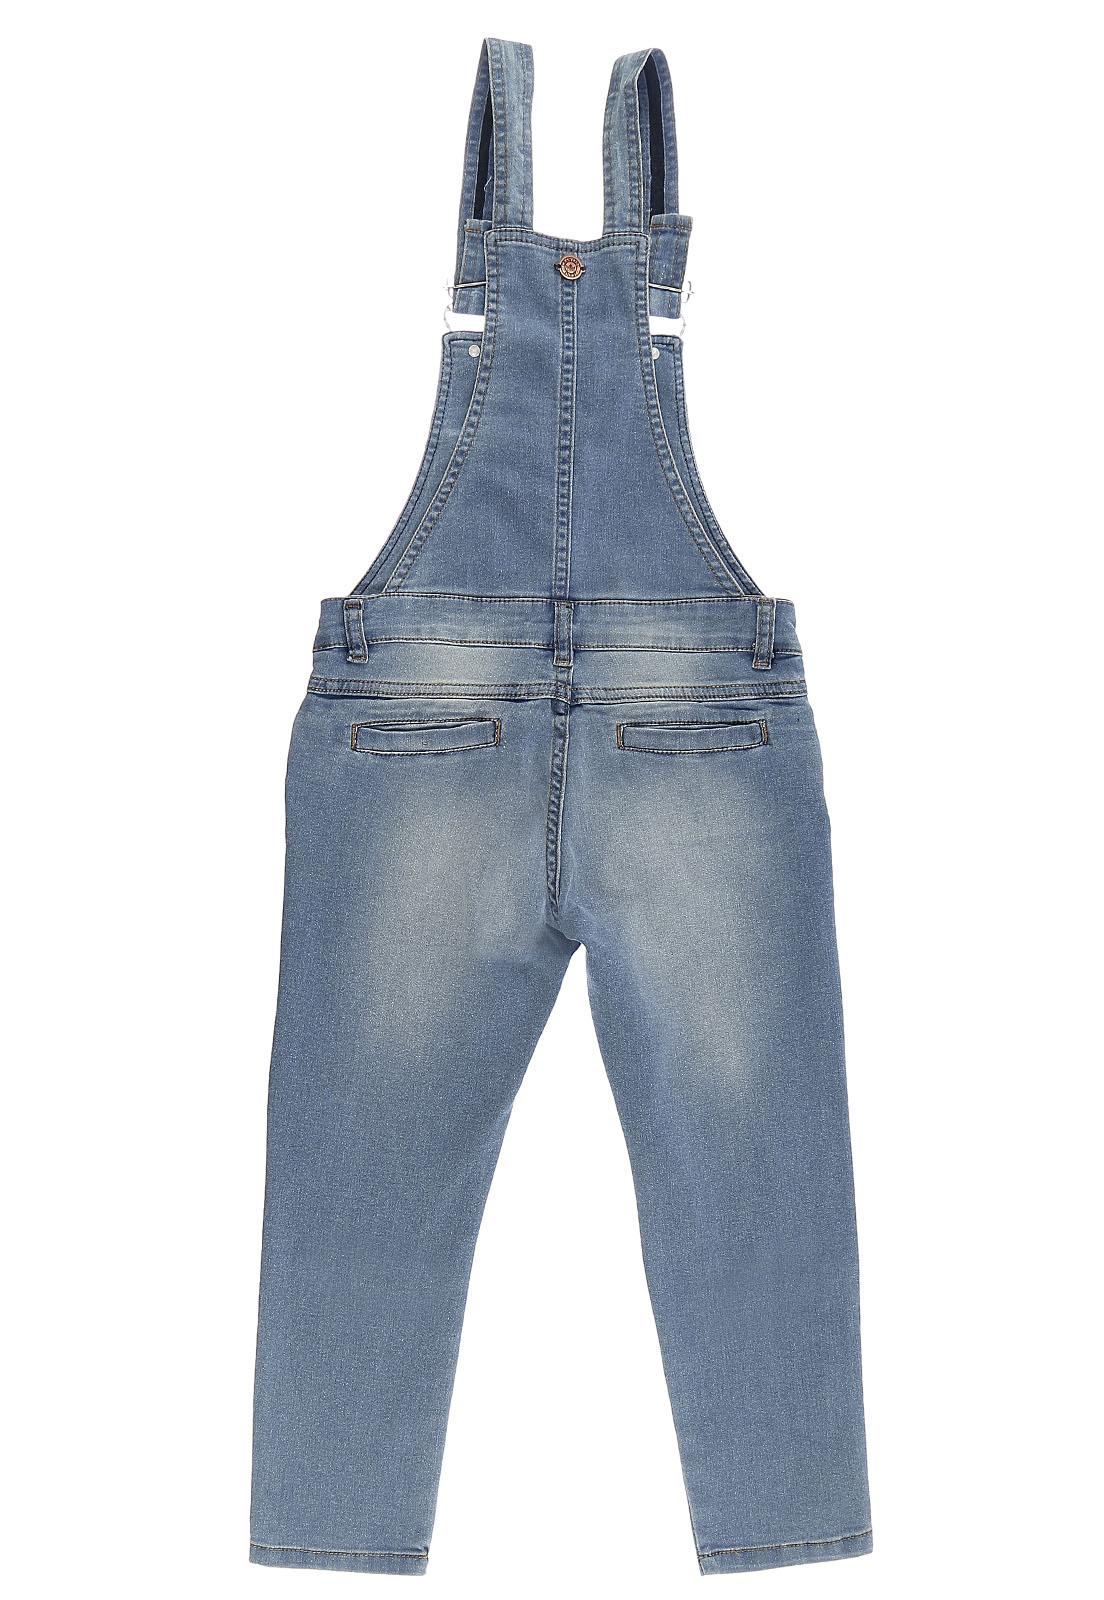 Jardineira Feminina Crawling jeans Cropped